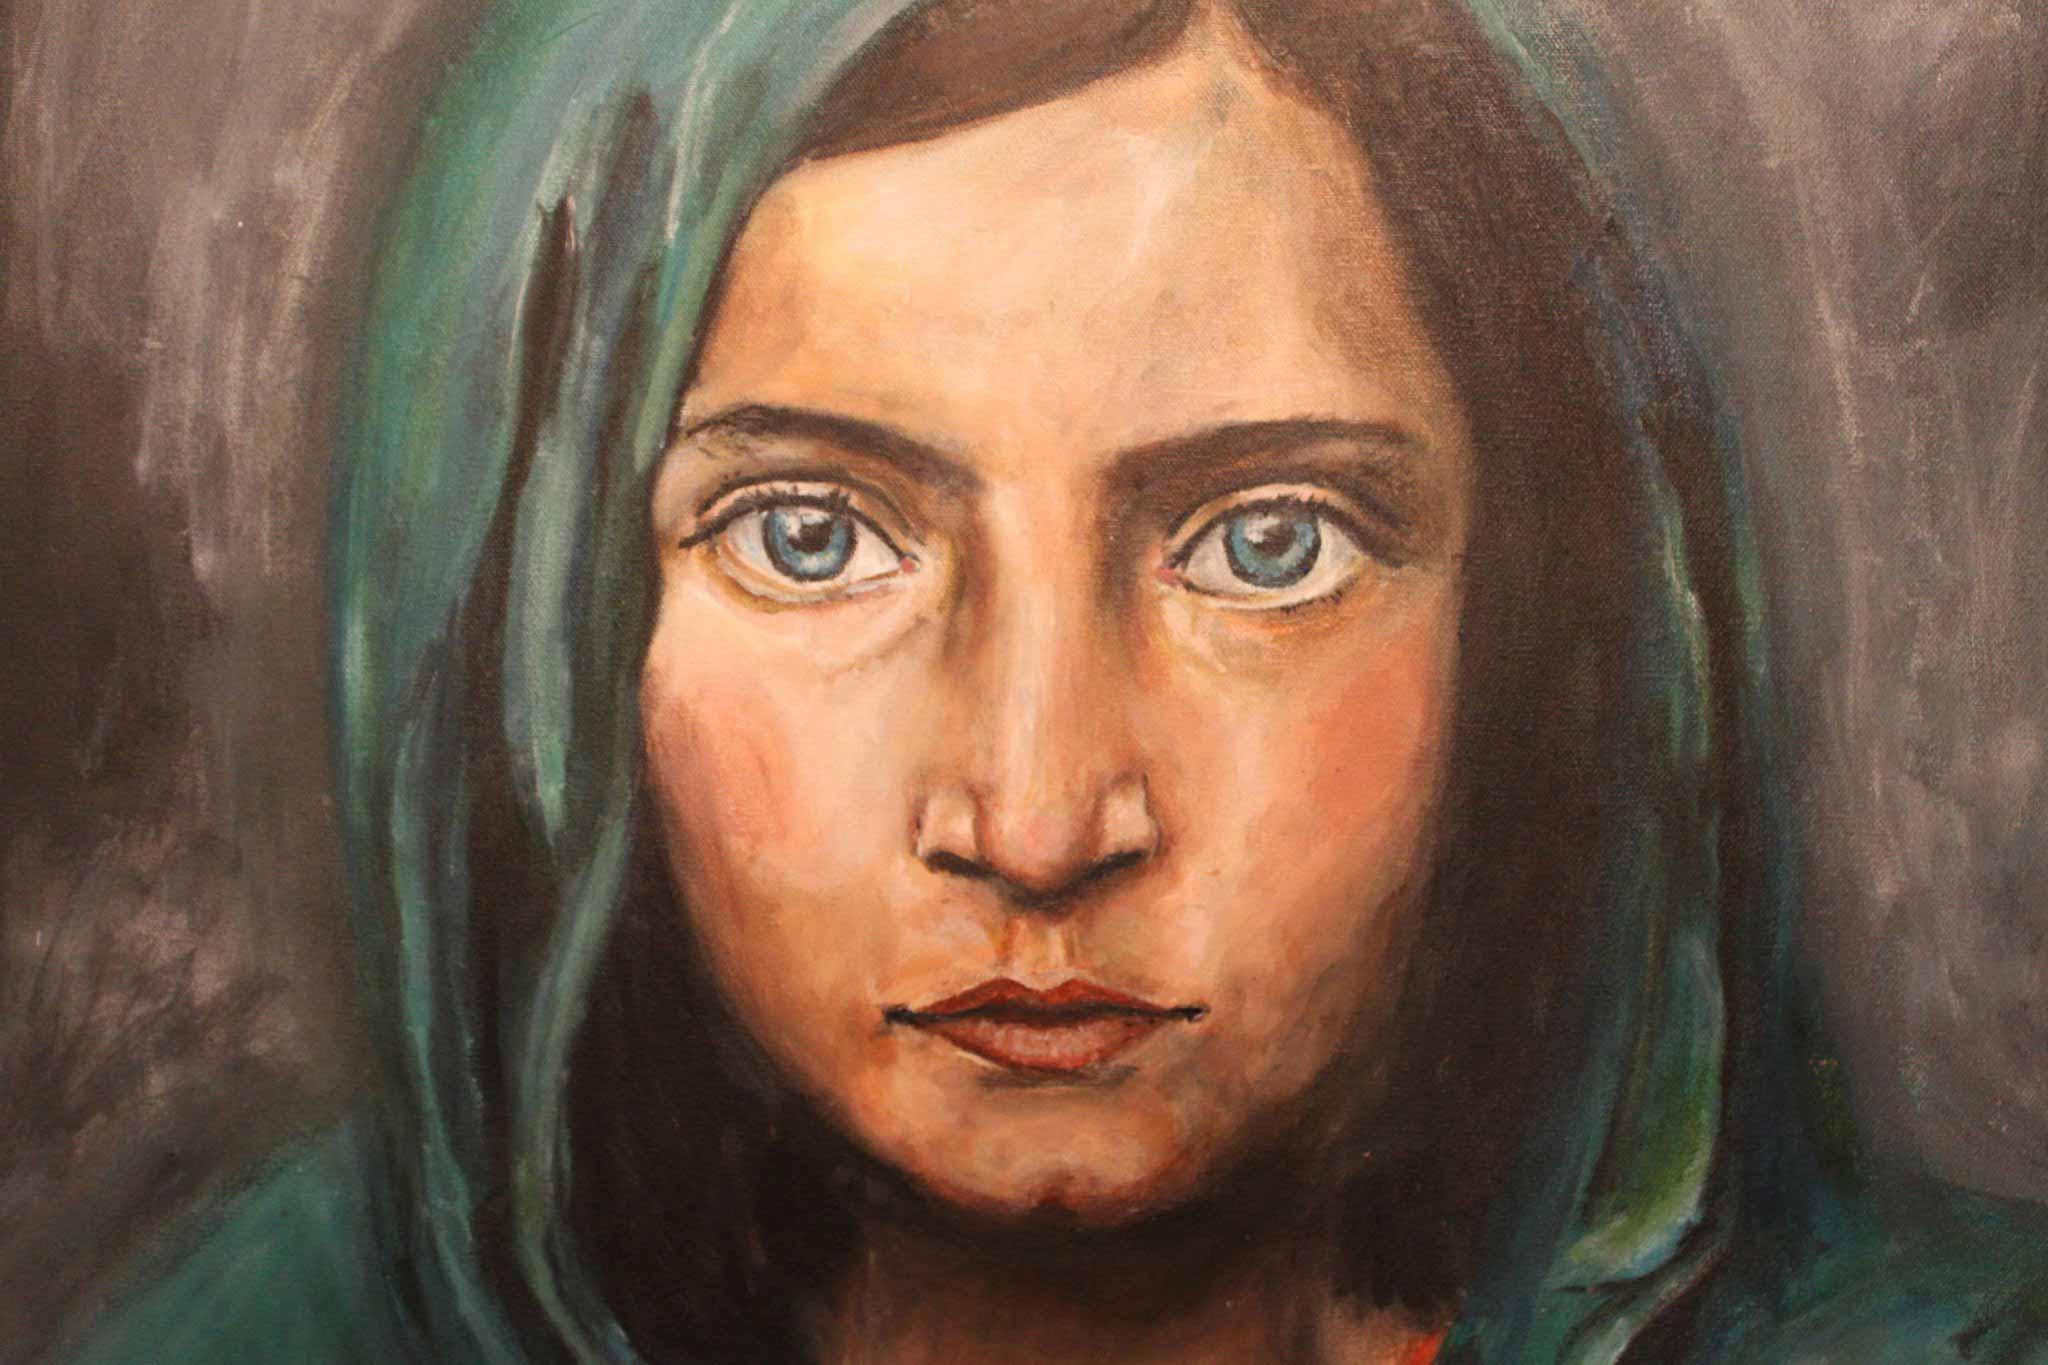 Blue Eyes, Alexander Neumann